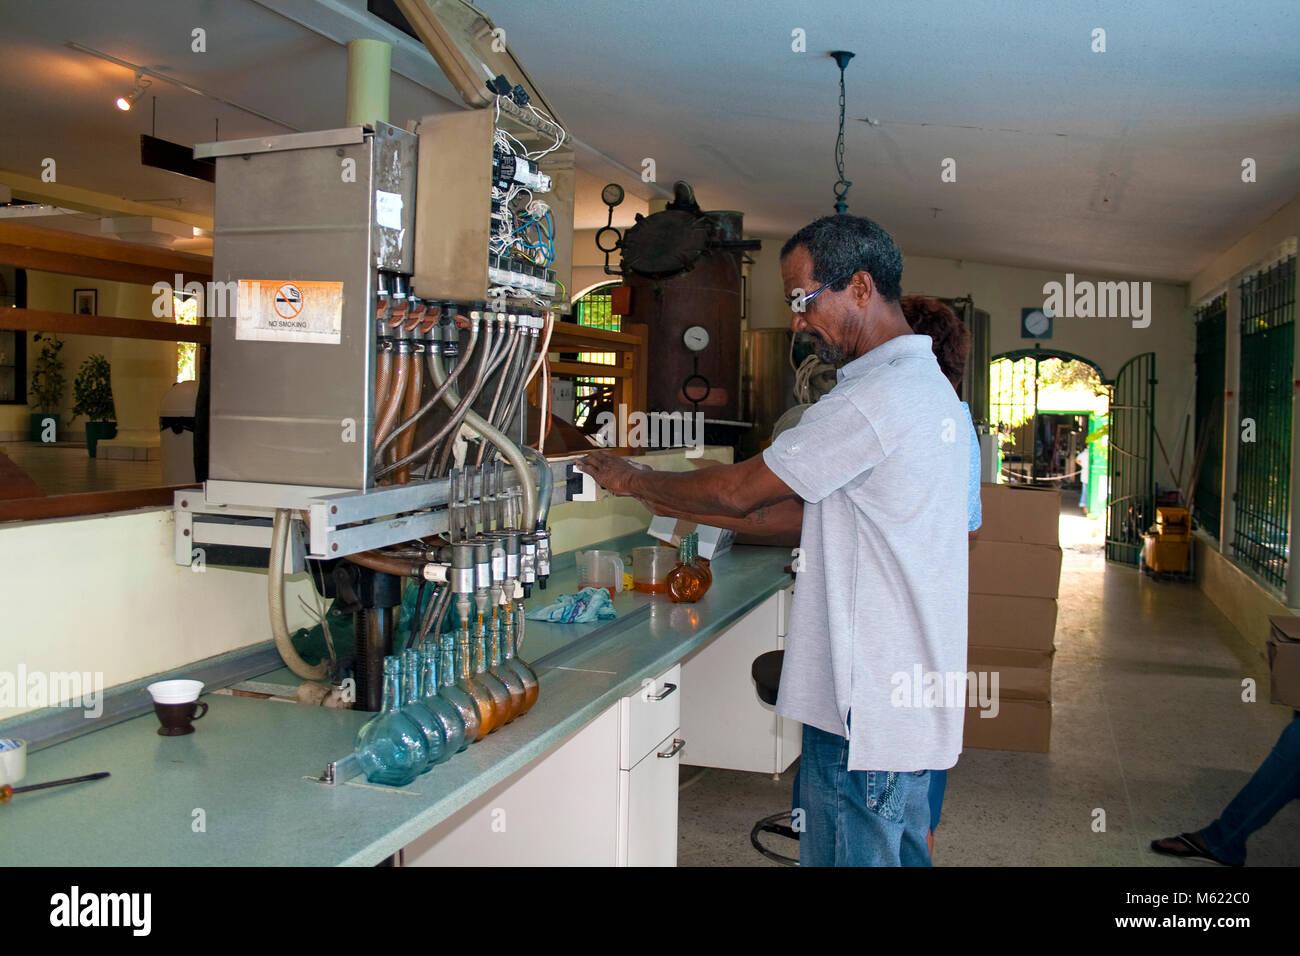 Liqueuer Chobolobo, fabricación, envasado del famoso Blue Curacao, Willemstad, Curazao, Antillas Holandesas, Imagen De Stock